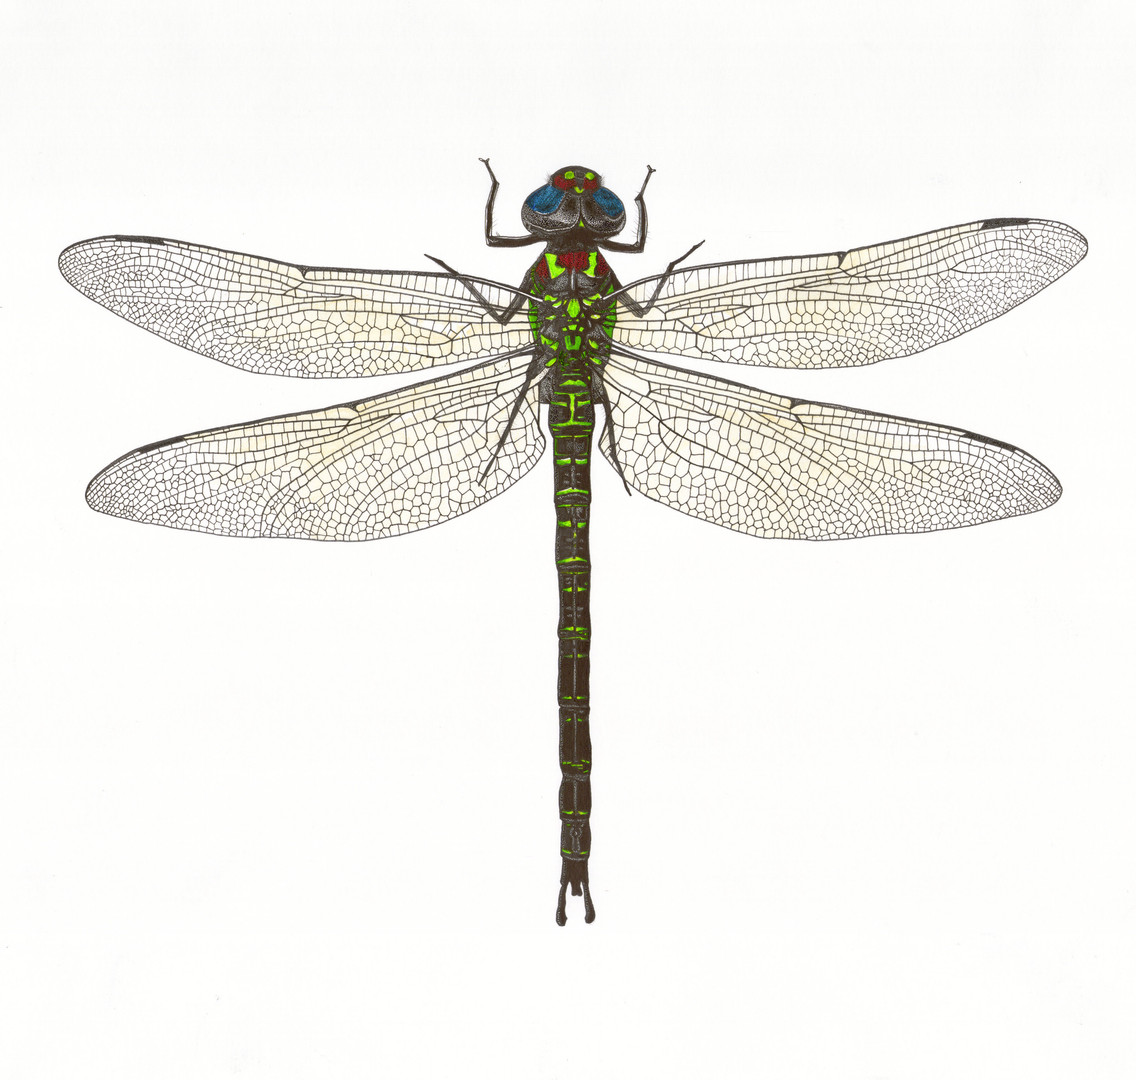 Dragonfly # 1 illustration